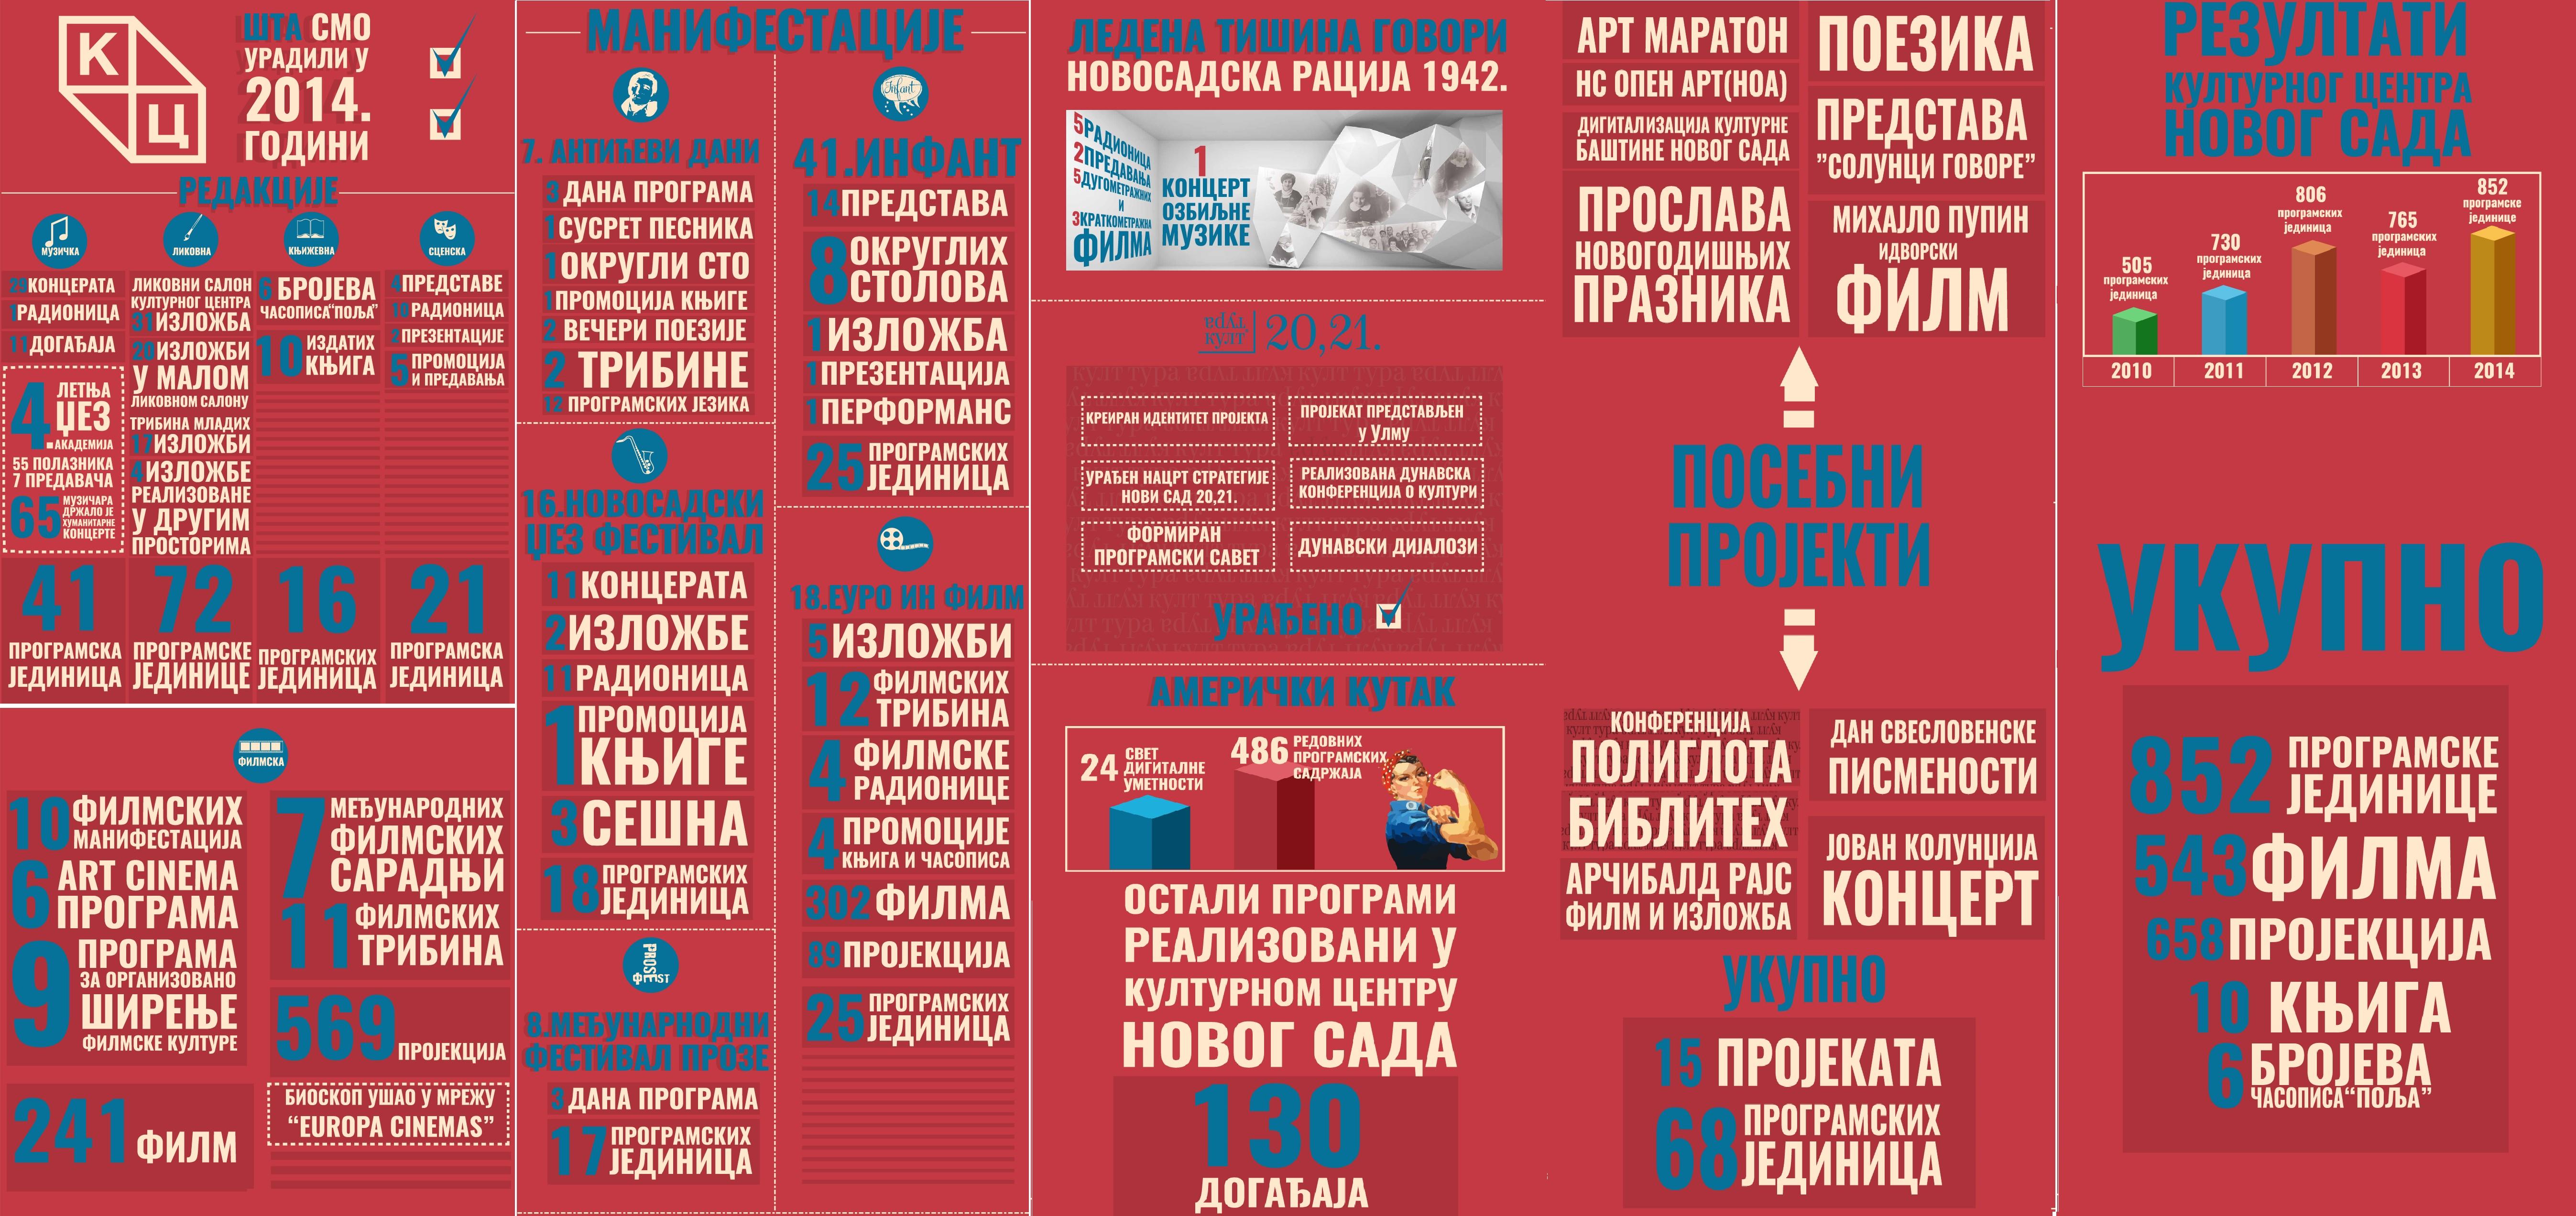 Infografika 2015